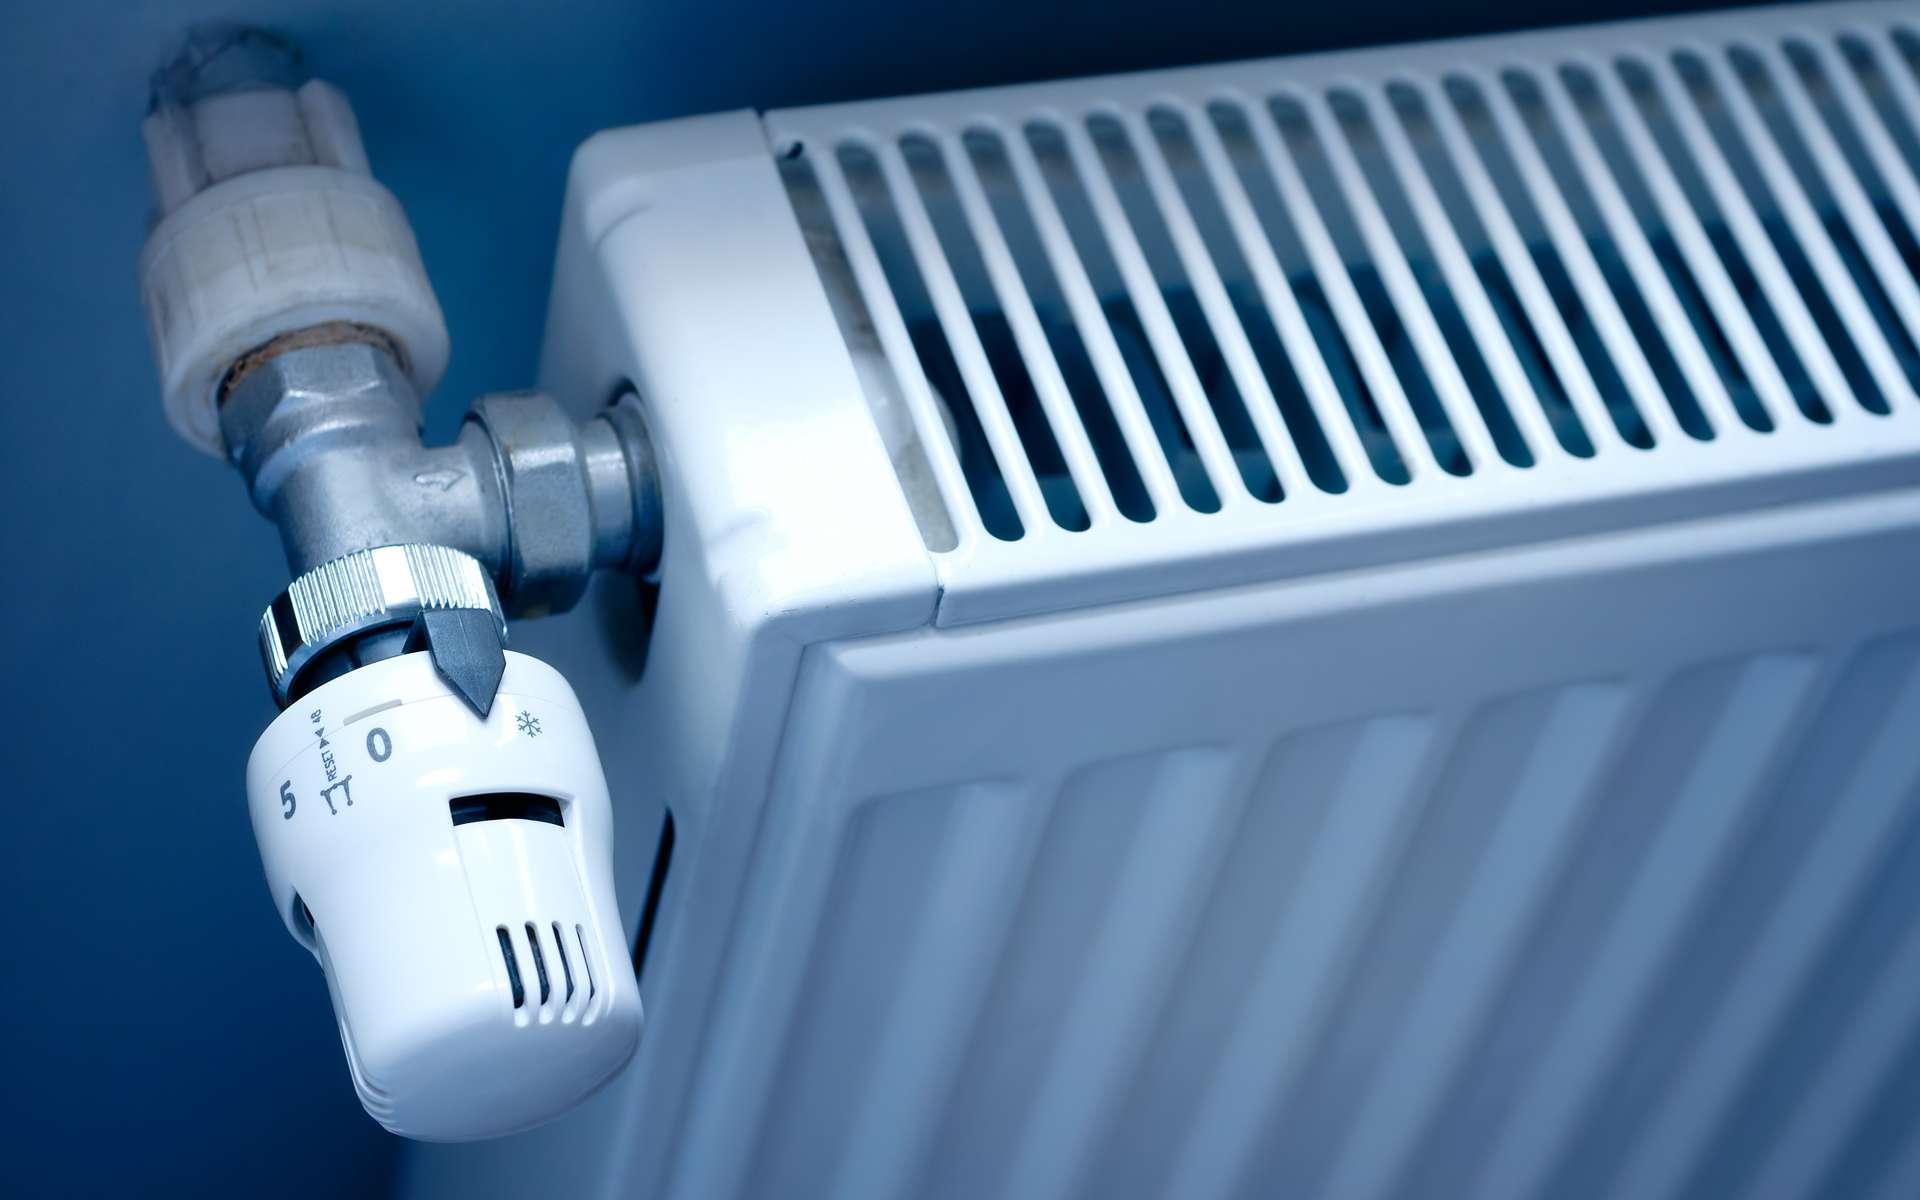 Régler le radiateur à la température idéale. © Özgür Güvenç, Adobe Stock